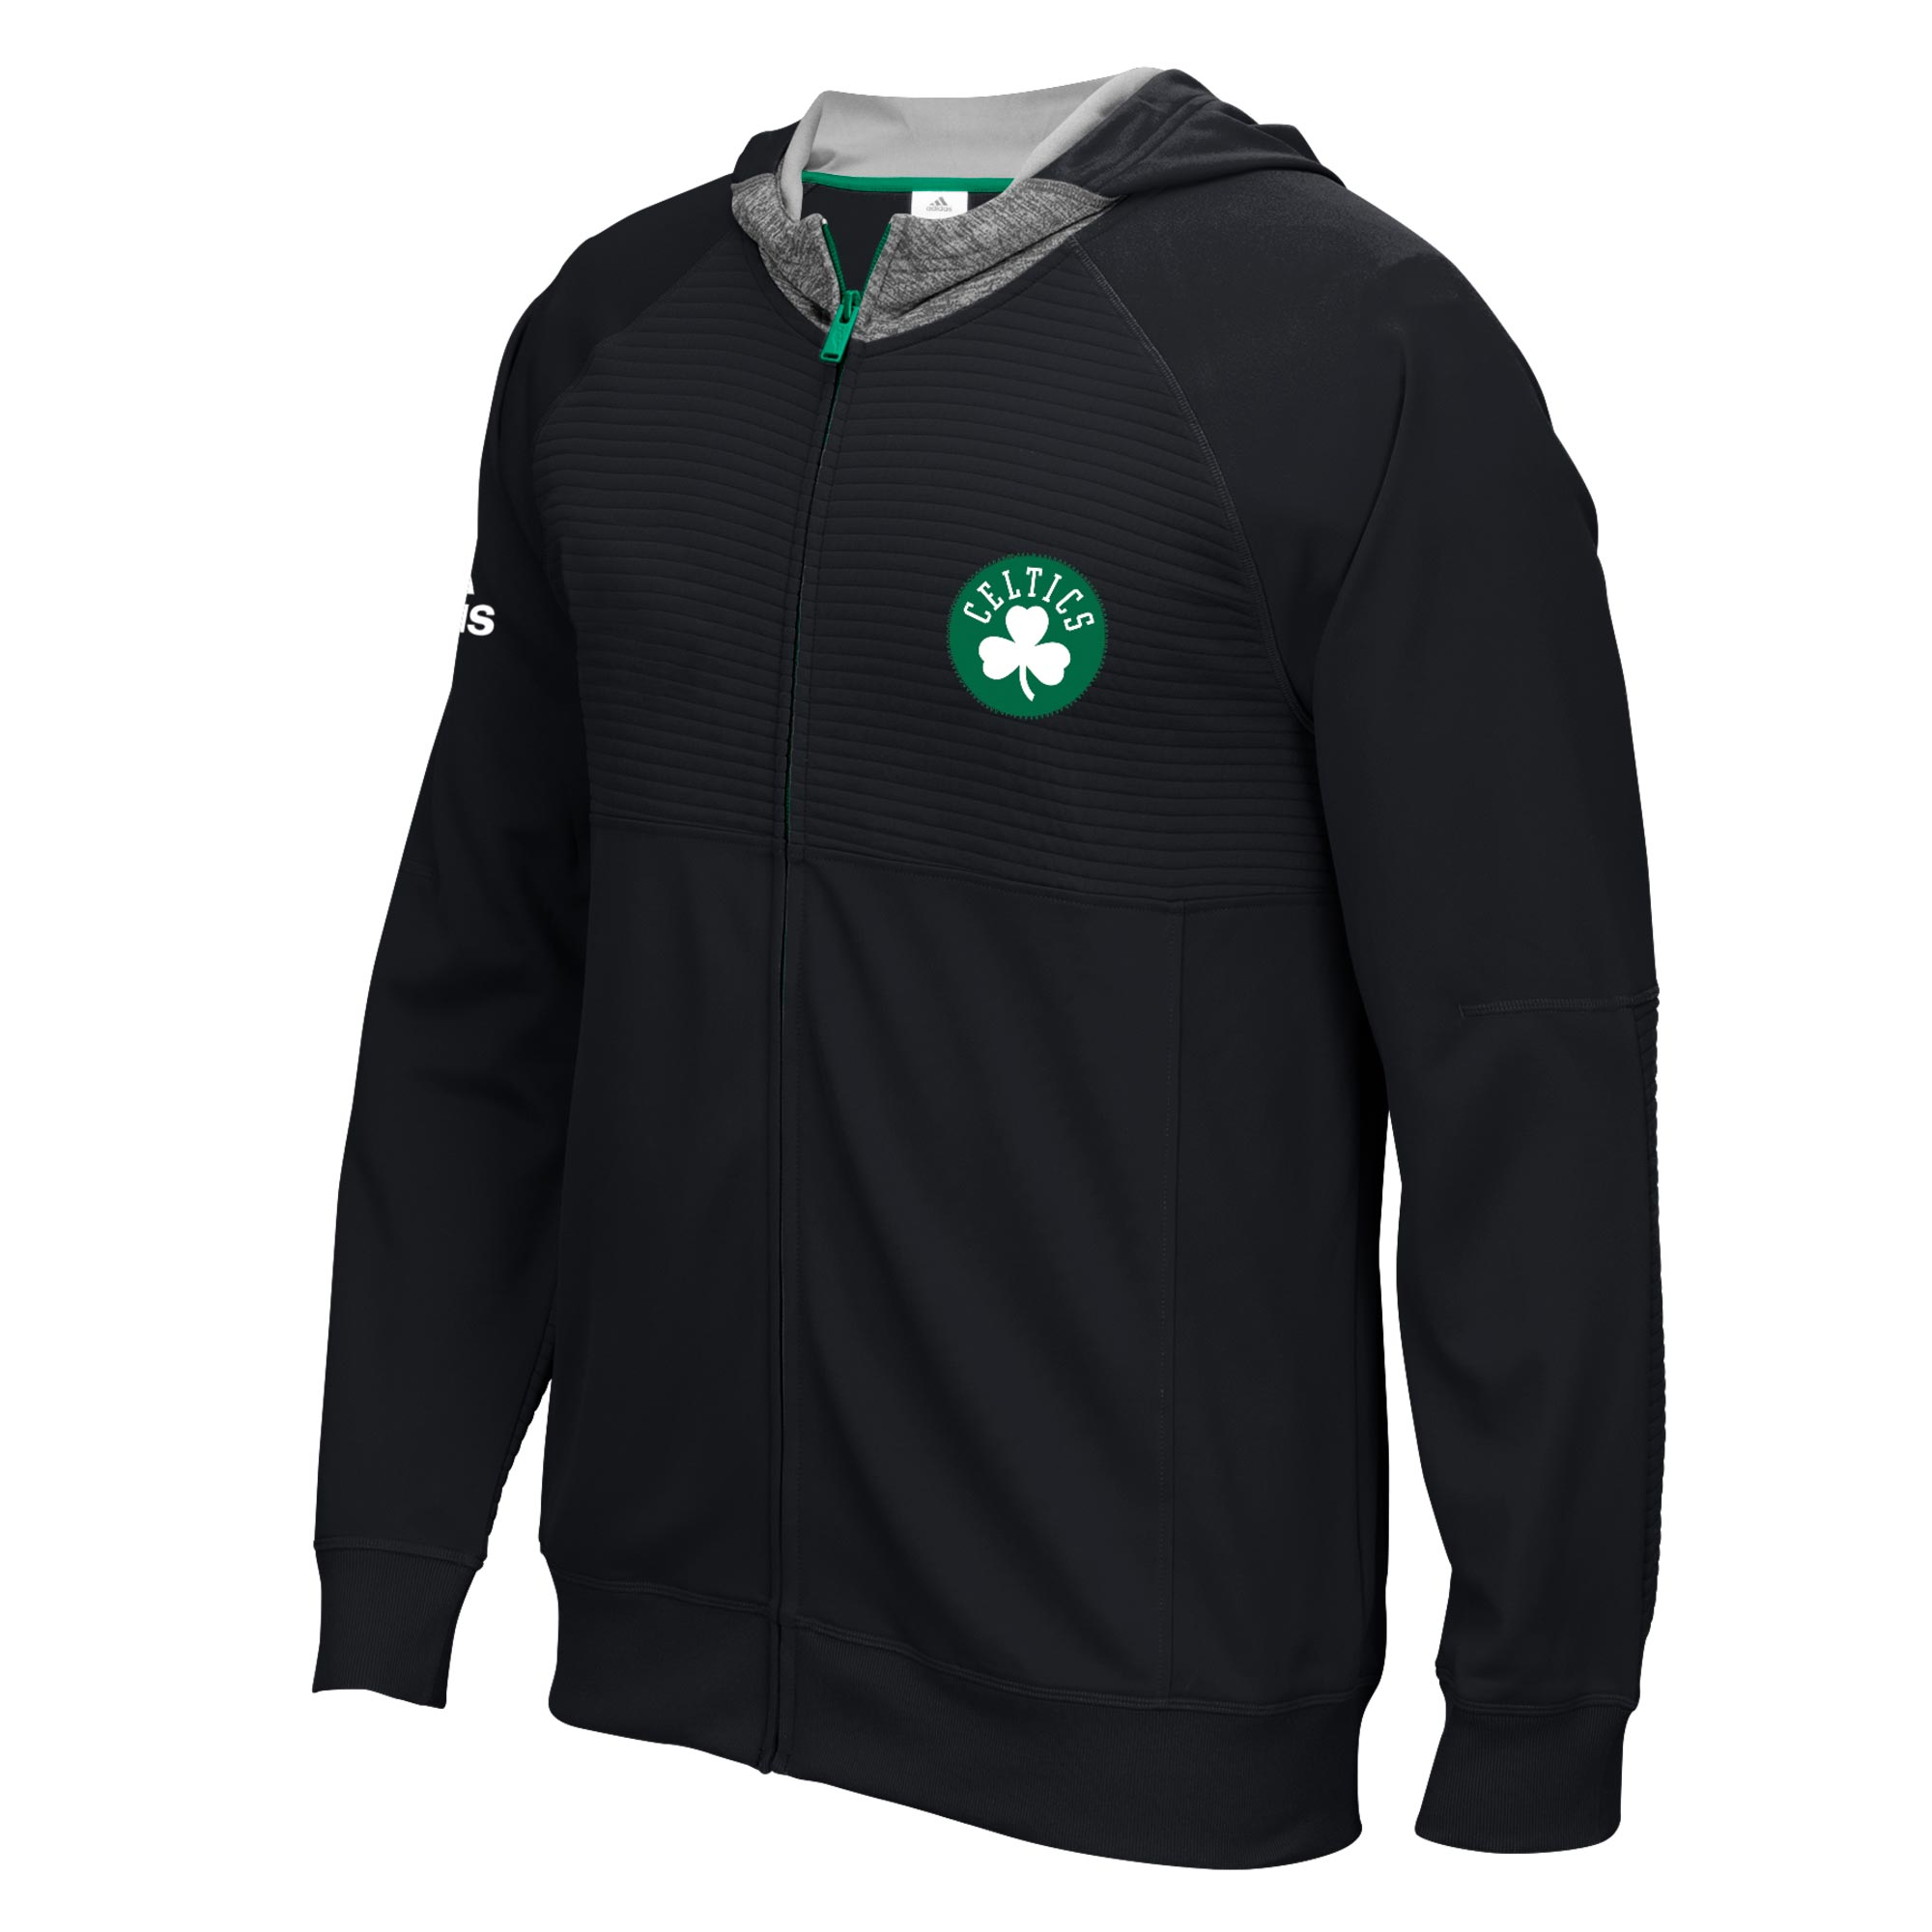 Boston Celtics Pre-Game Hooded Jacket 2016-17 - Youth